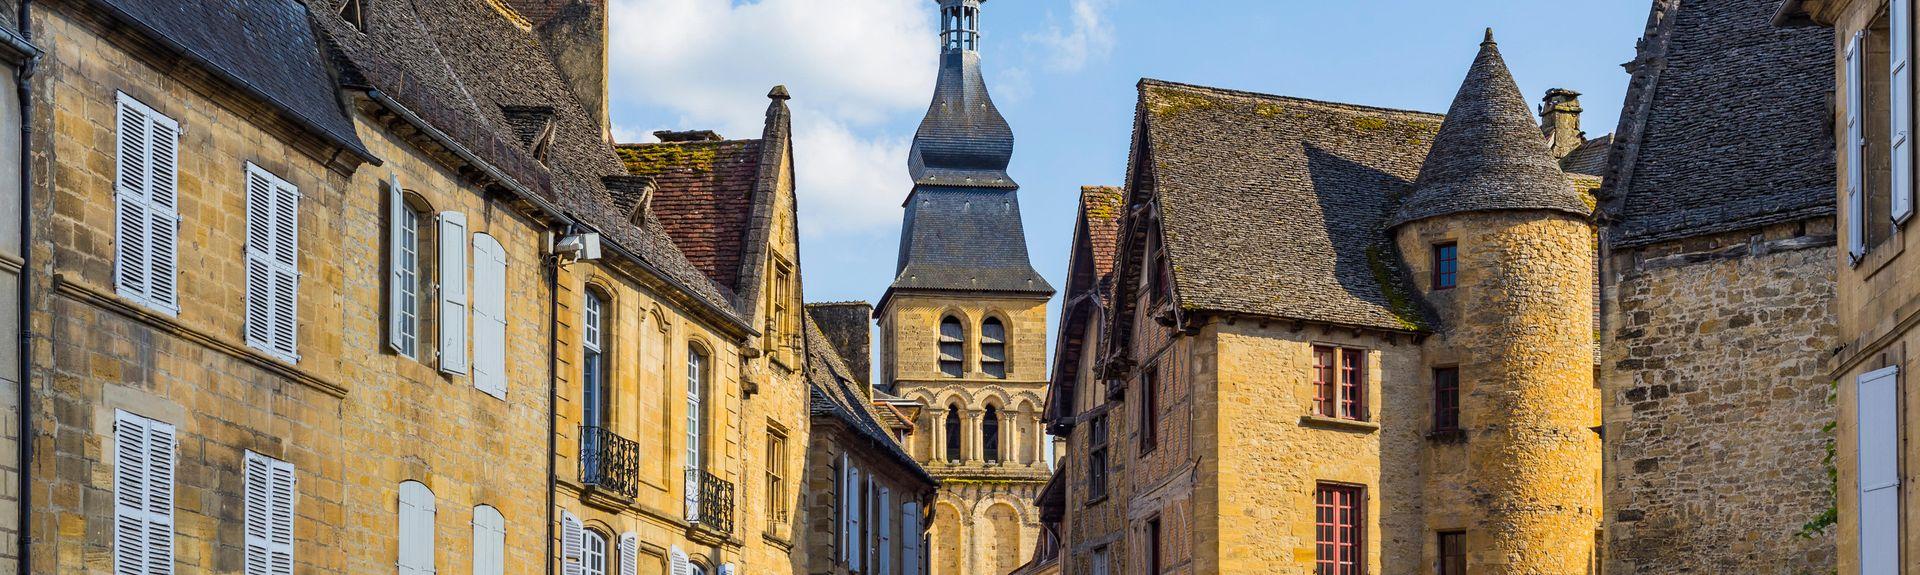 Sarlat-la-Canéda, Dordogne, Frankrike